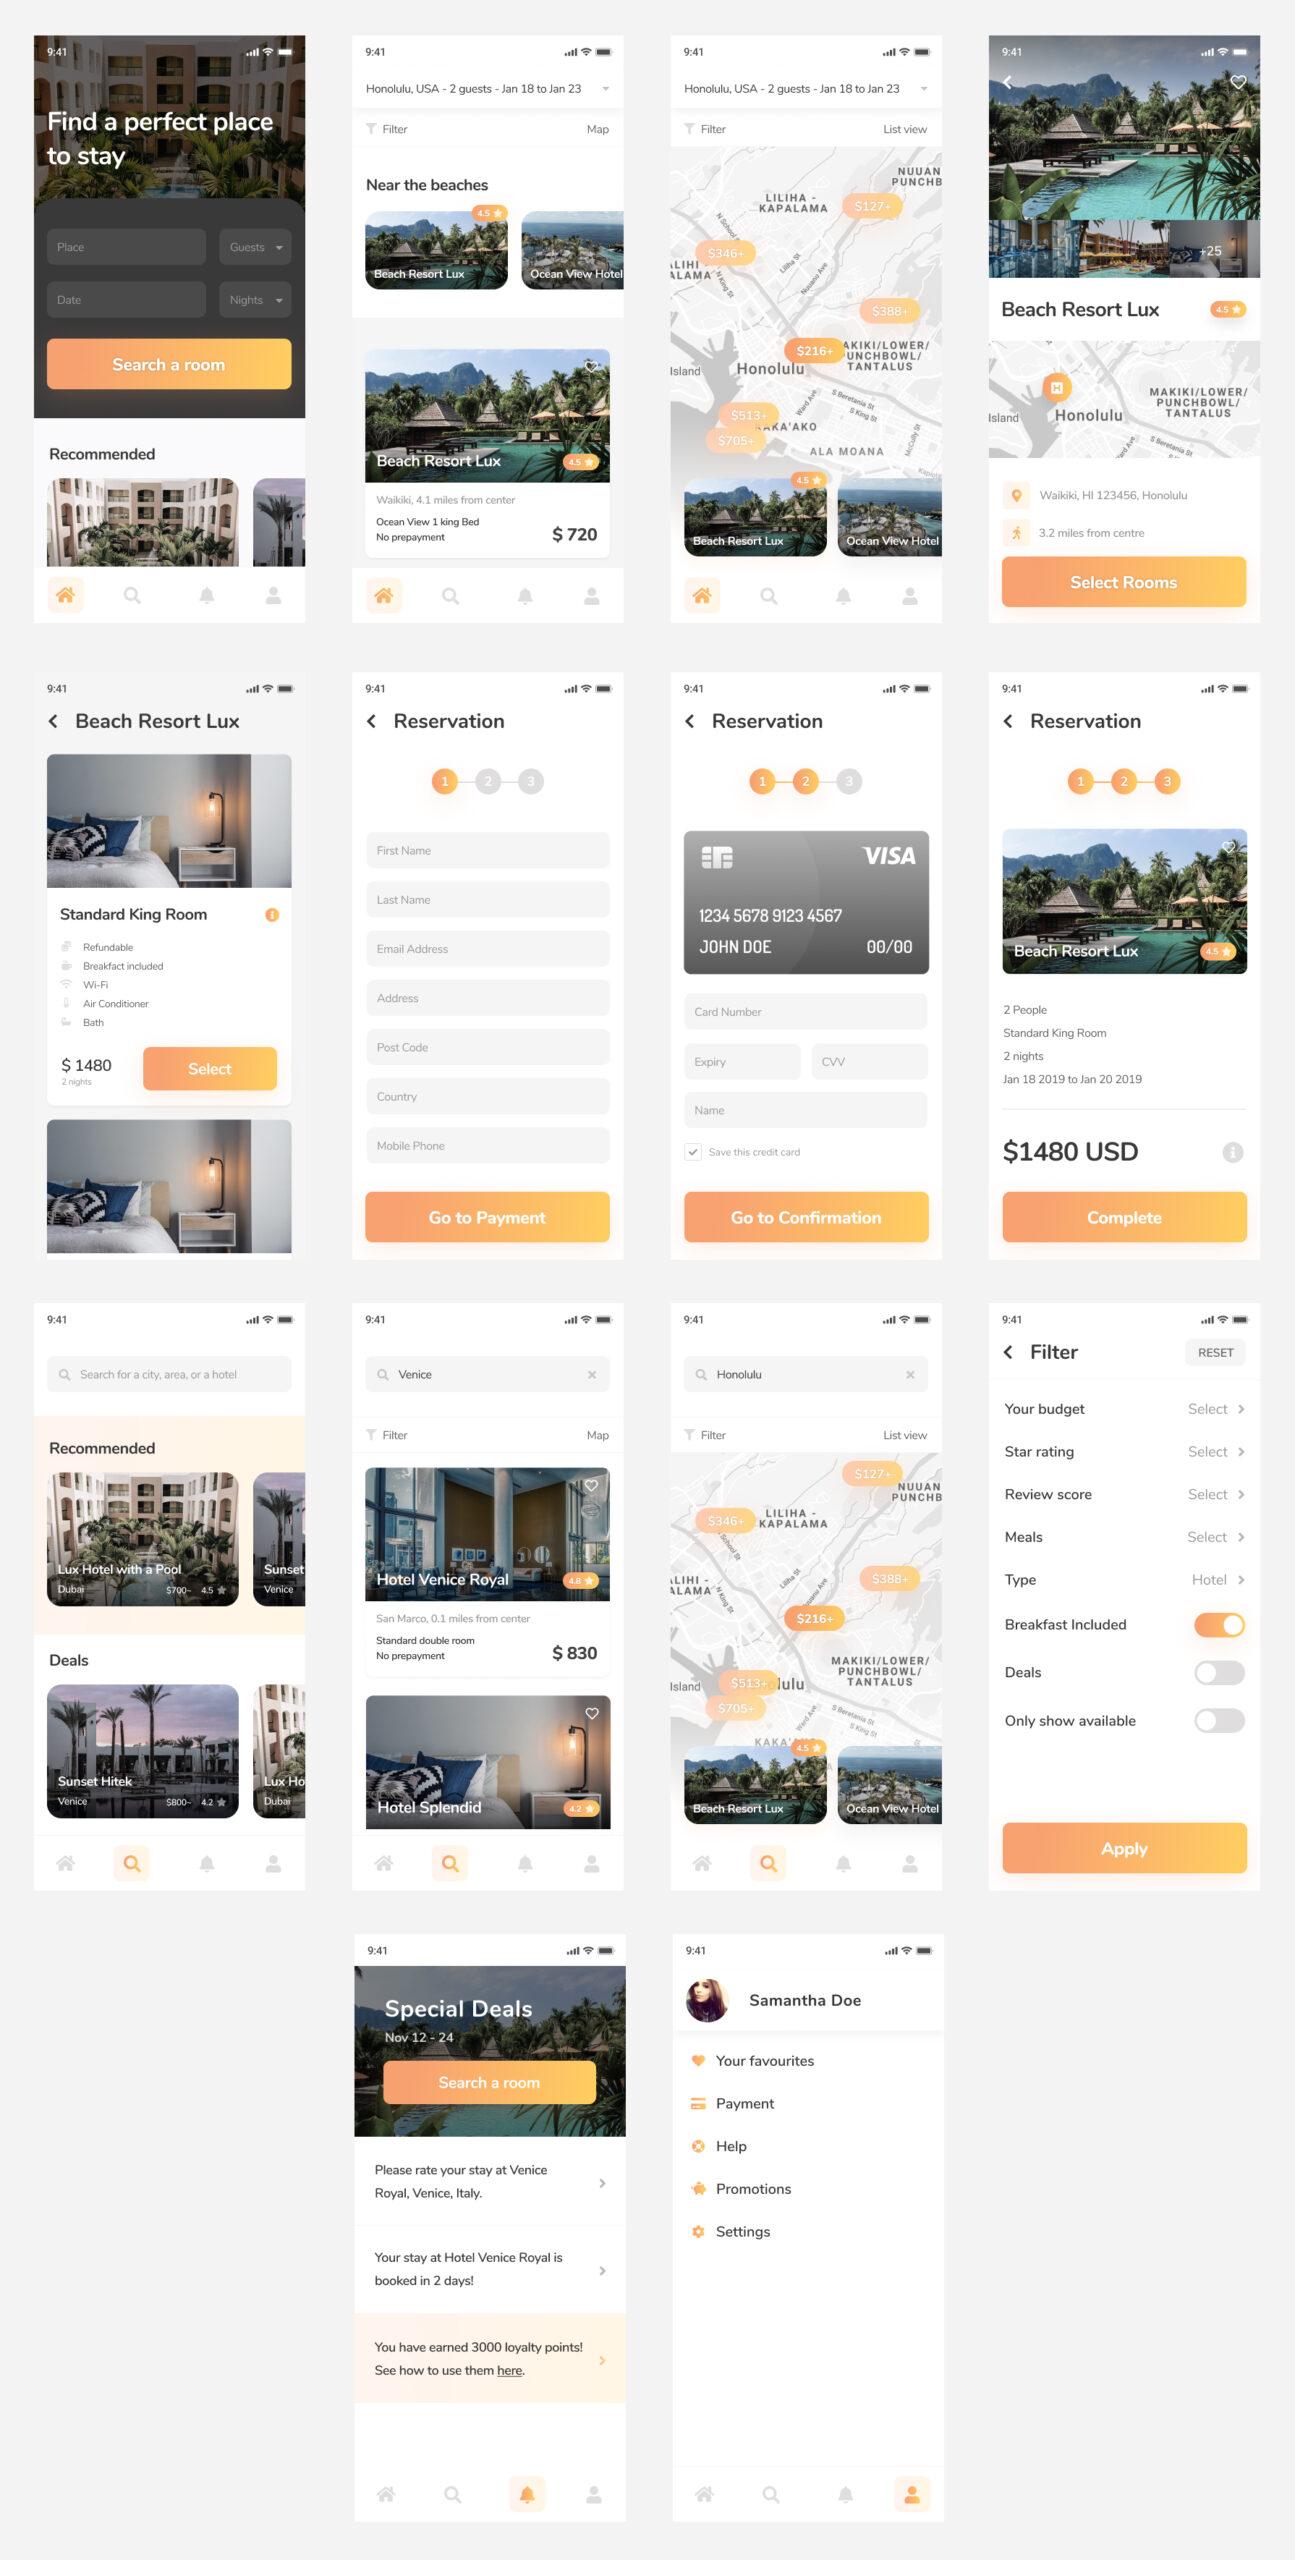 Hotelify-酒店预订应用程序设计UI插图